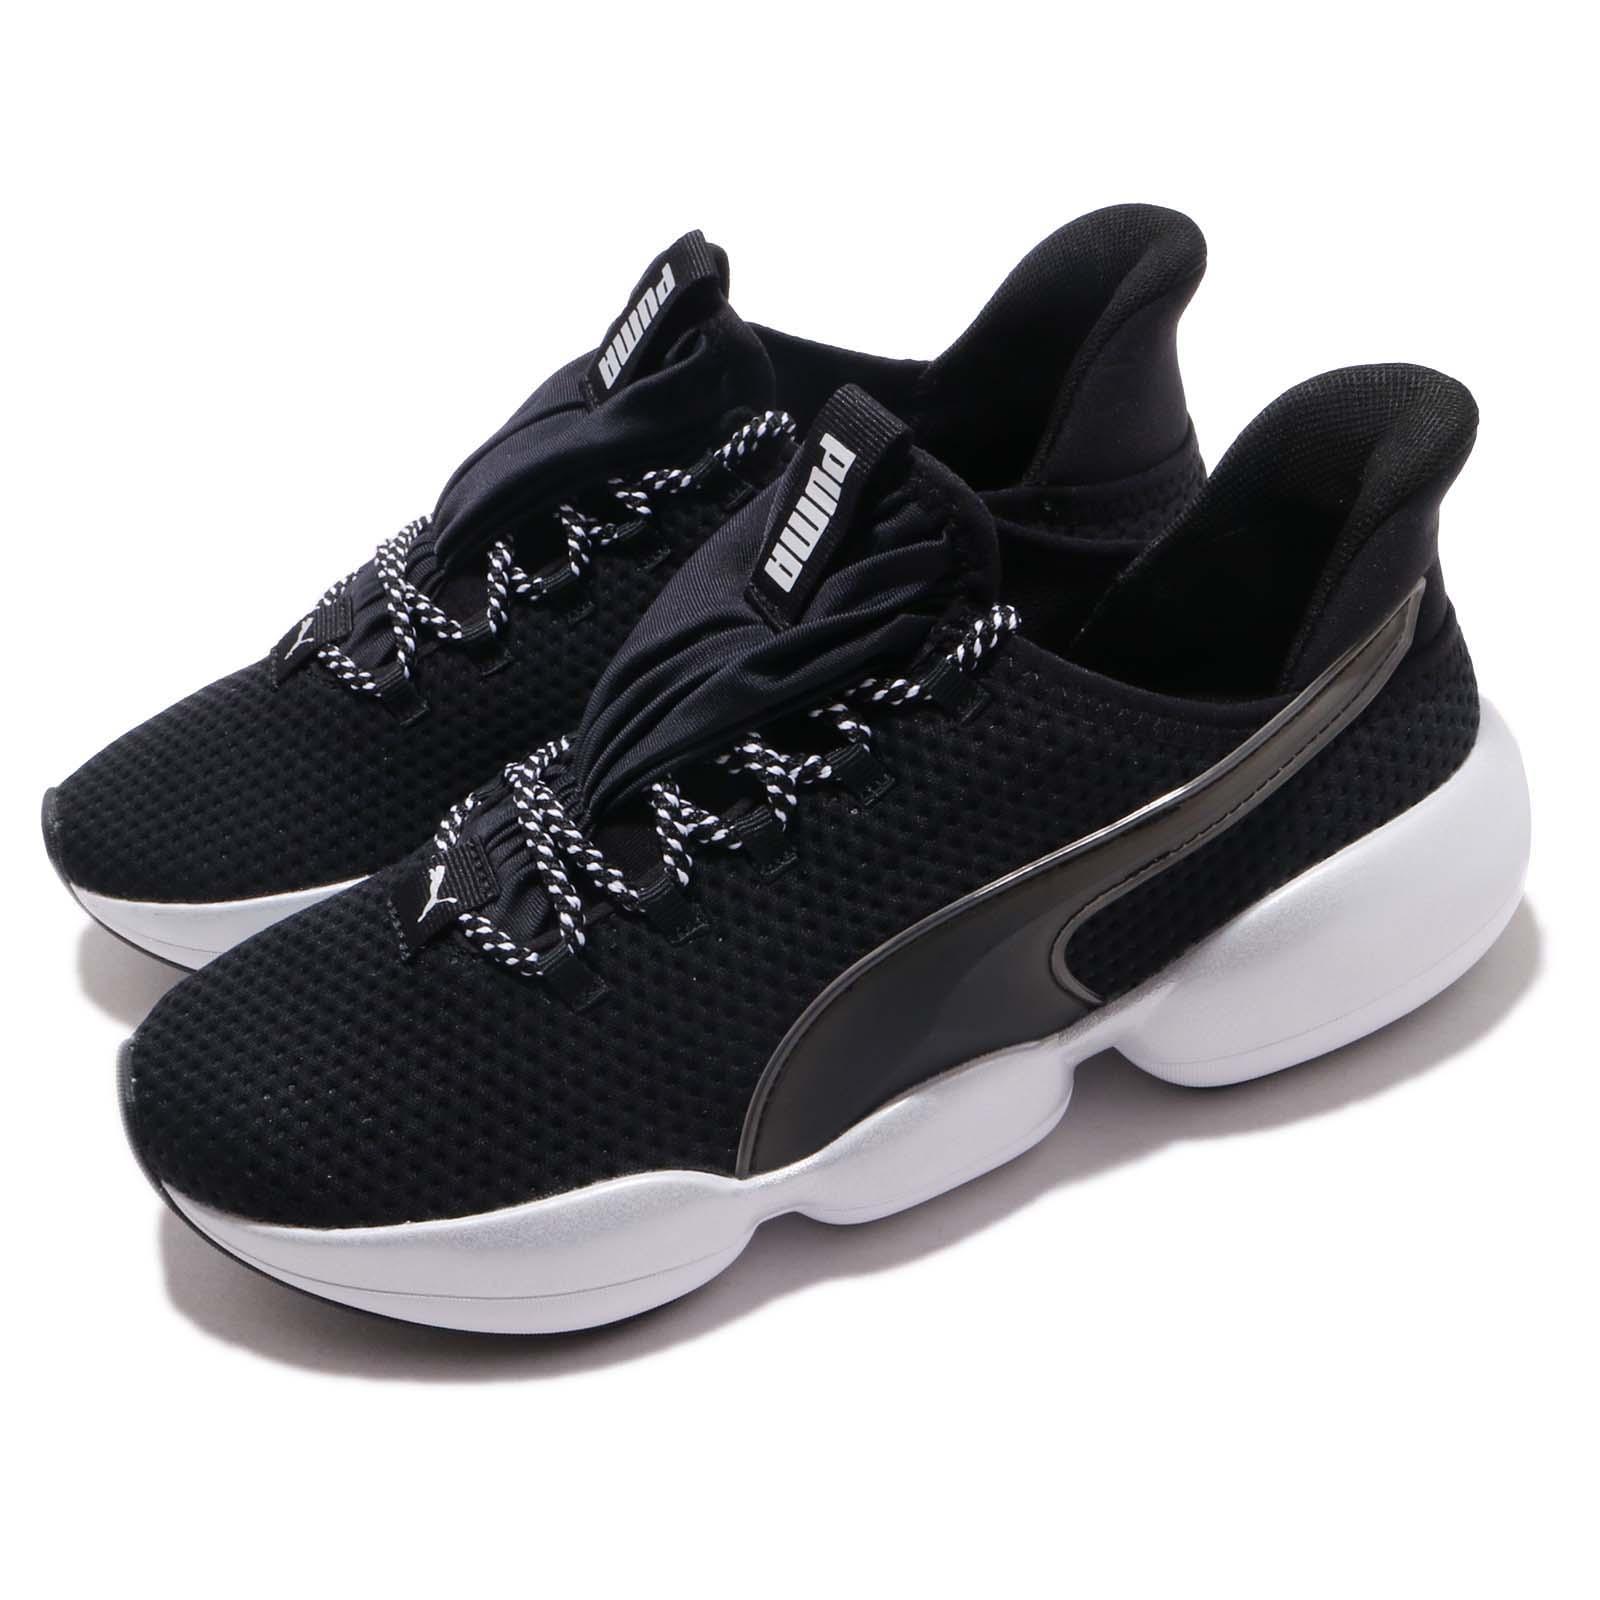 Puma 慢跑鞋 Mode XT 低筒 運動 女鞋 19226601